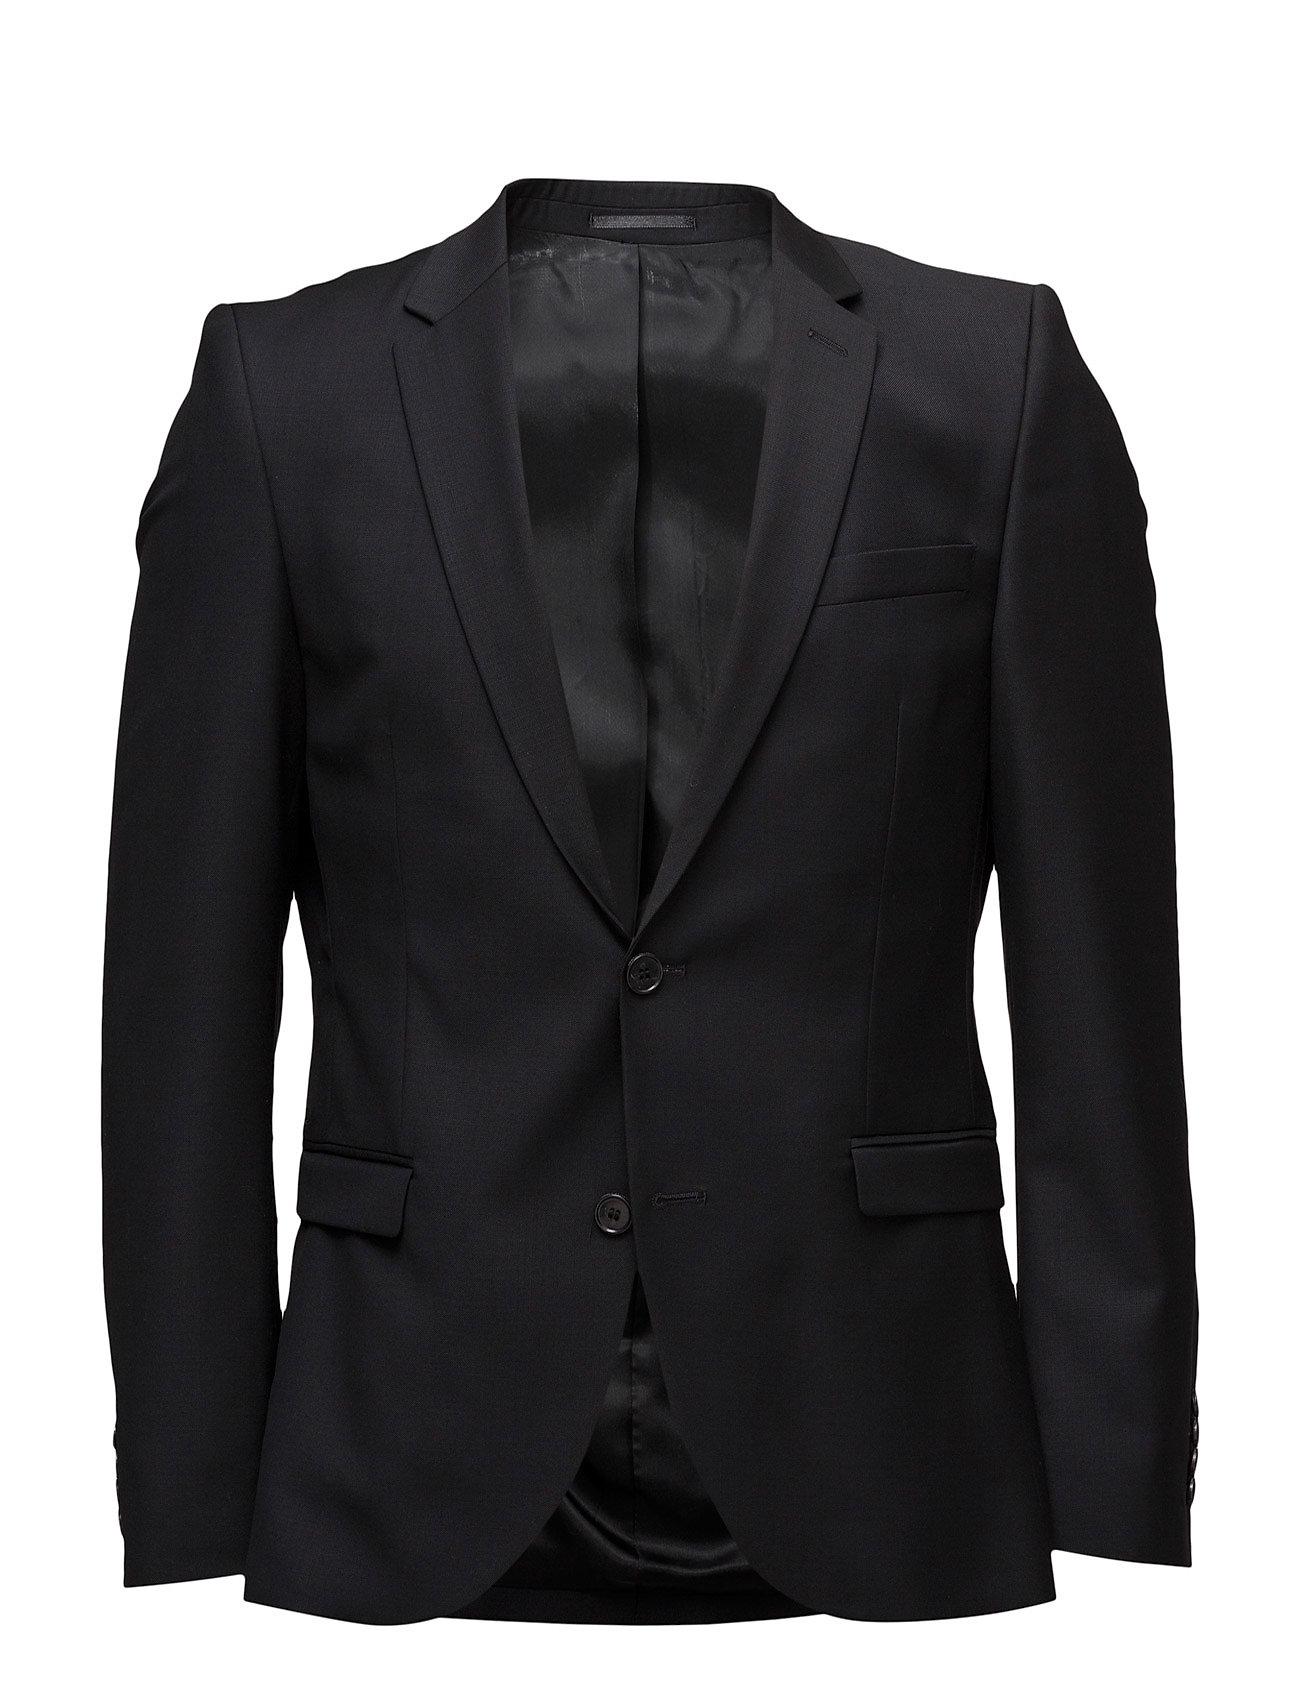 SELECTED Shd -Myloram5 Black Blazer Noos Blazer Jackett Schwarz SELECTED HOMME